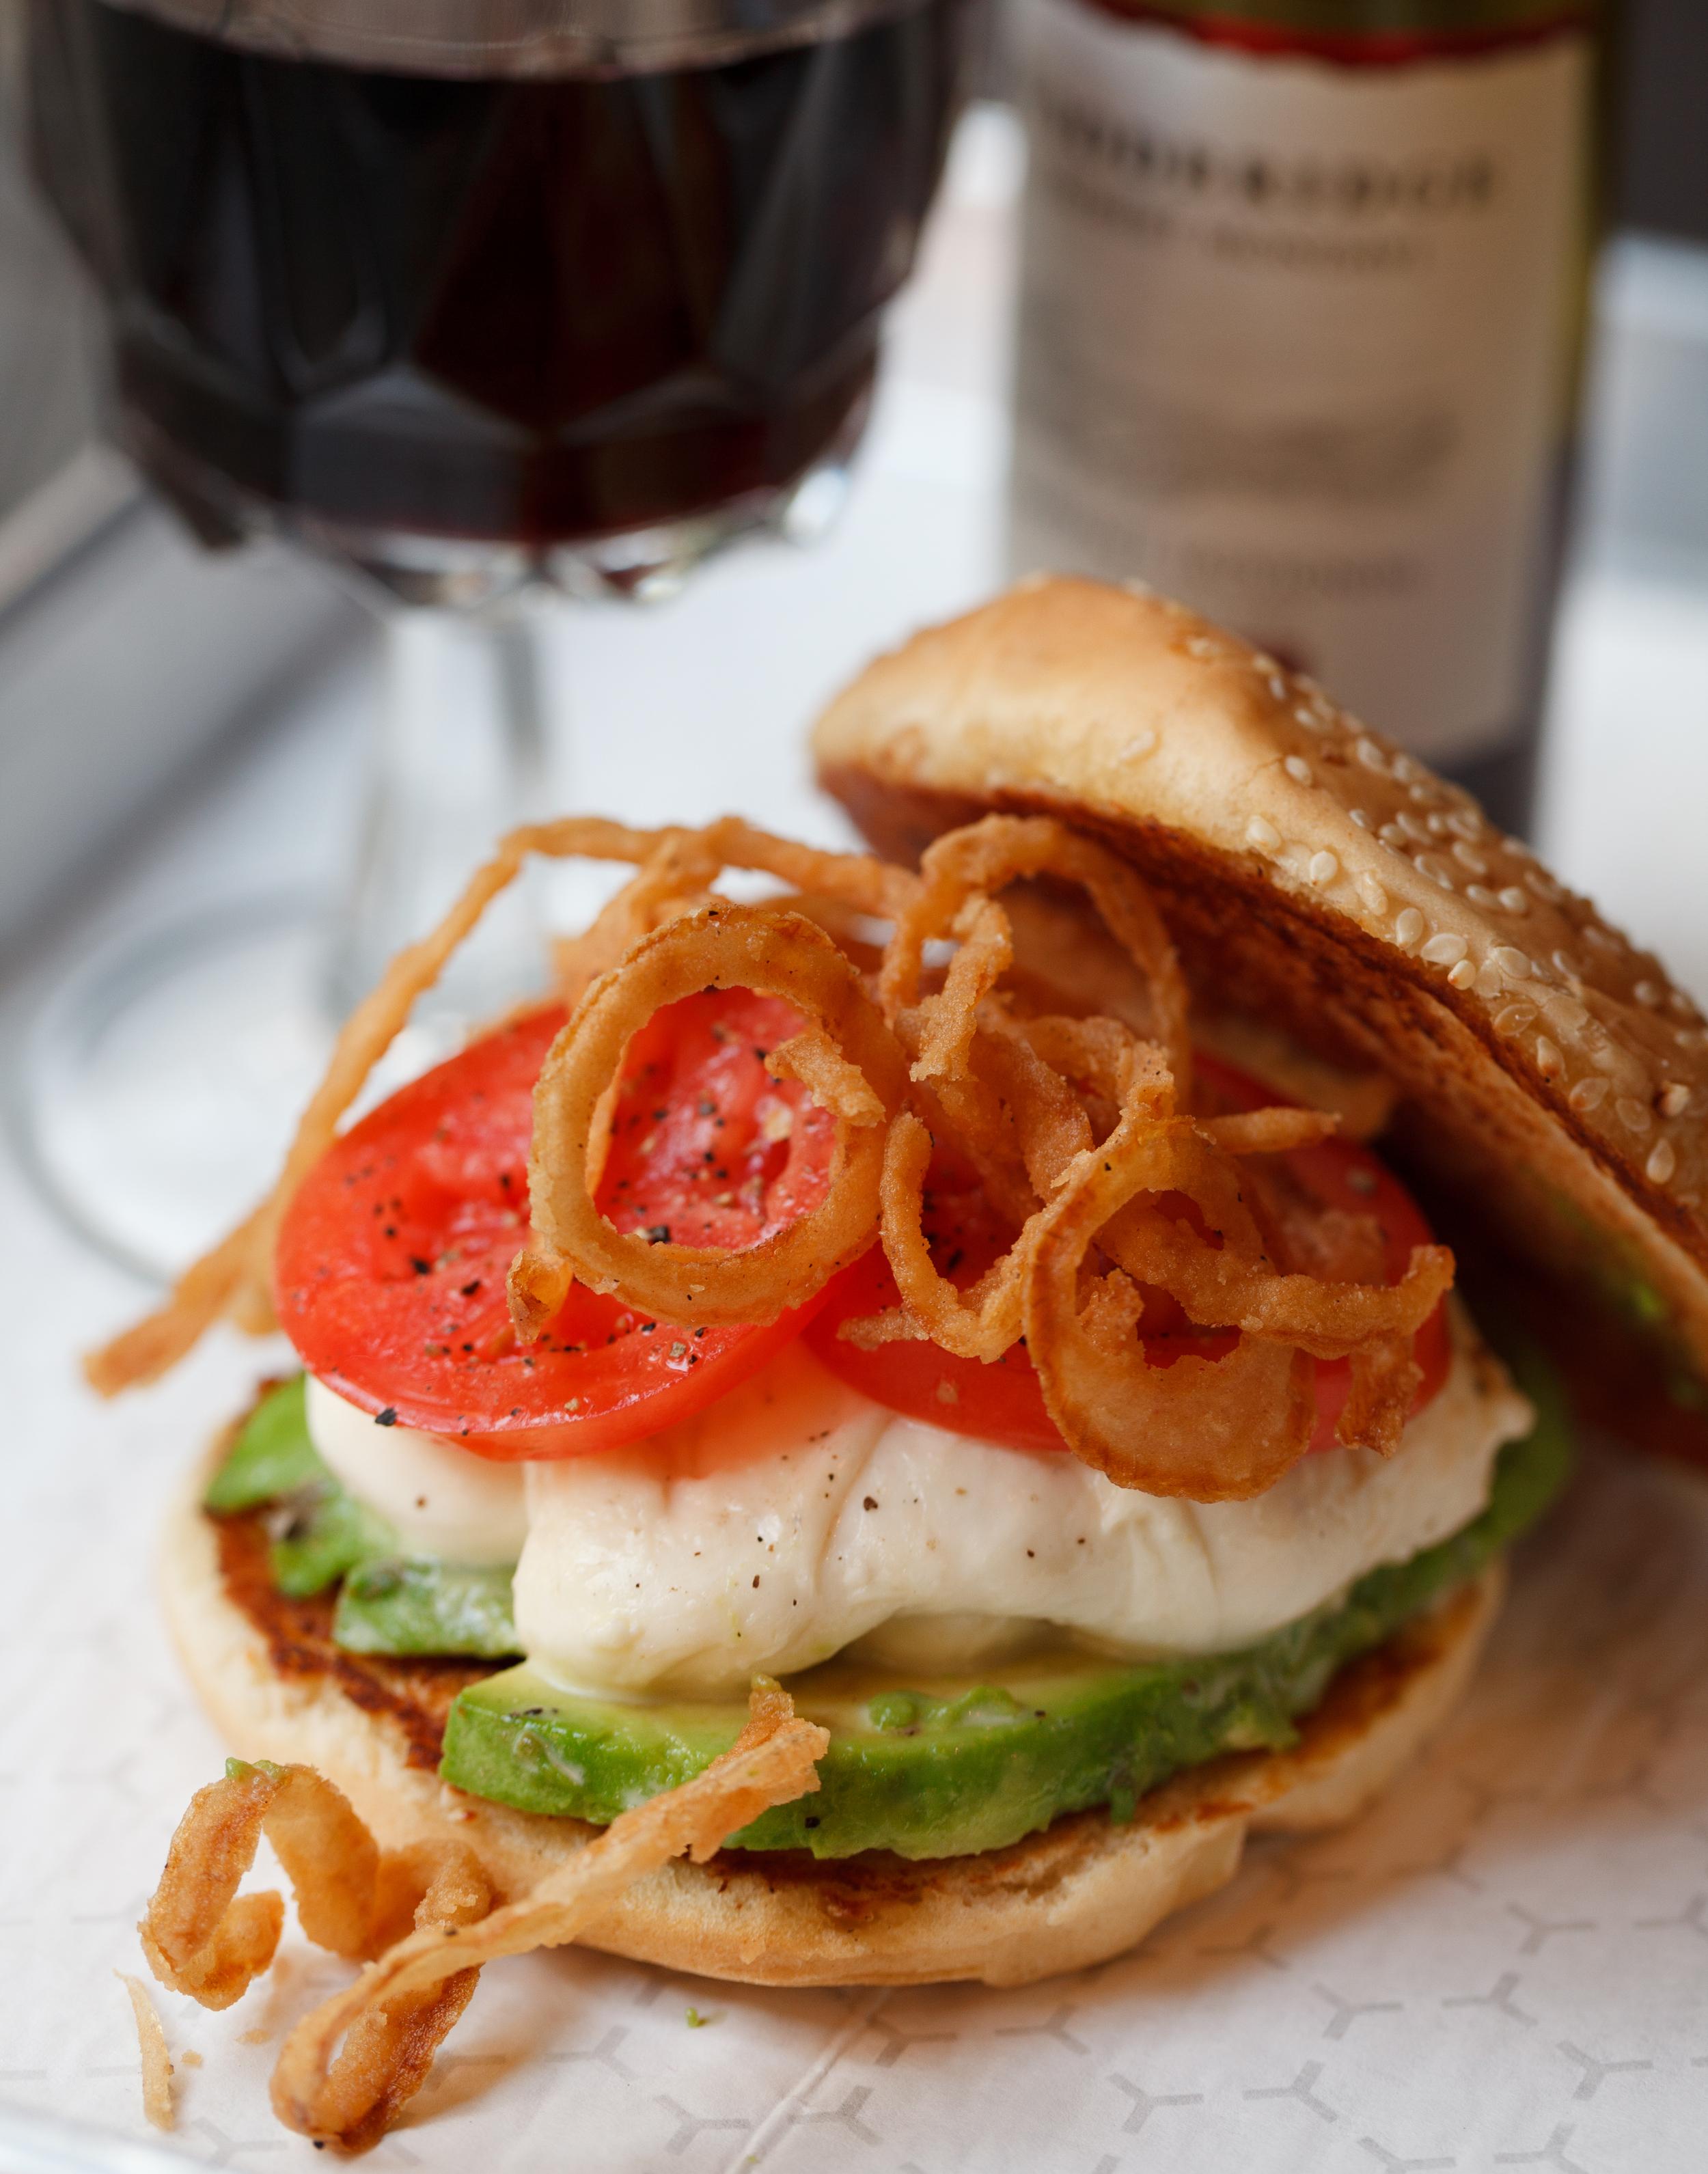 Mozzarella Sandwich from  Black Shack